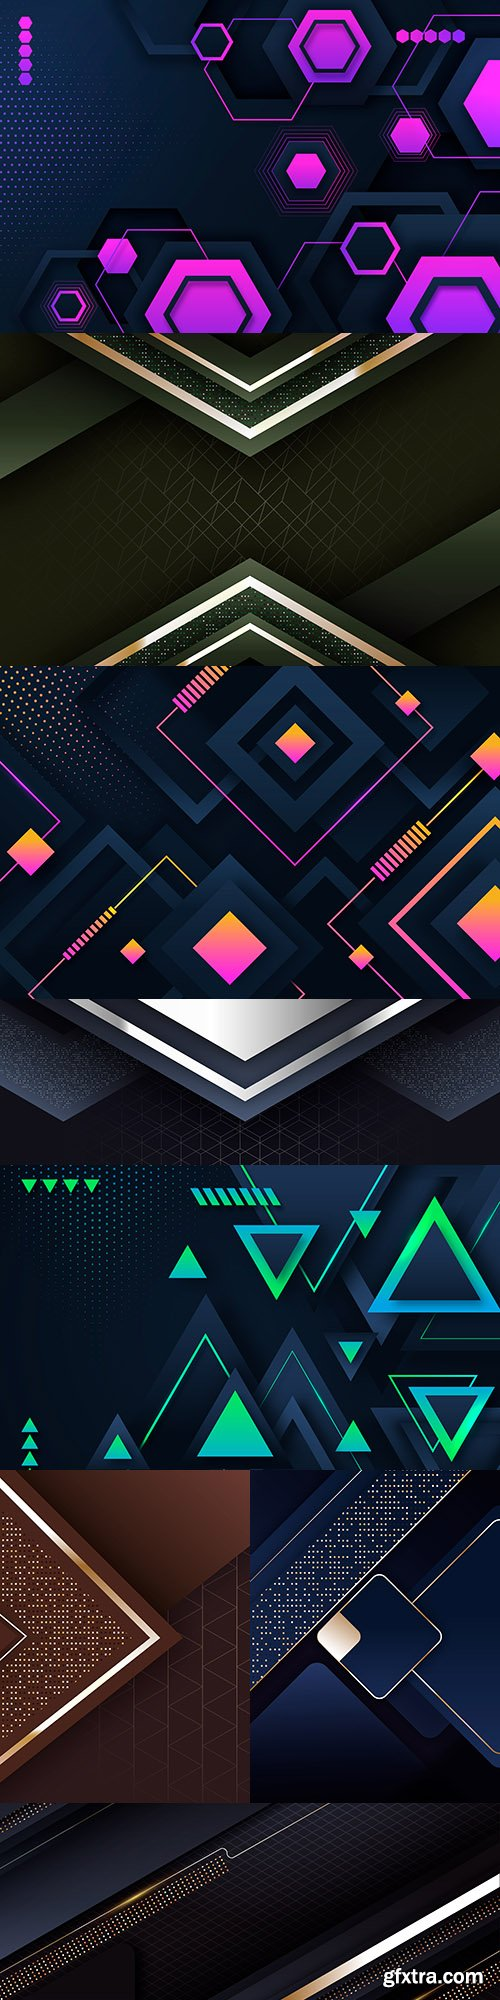 Gradient geometric shapes design dark background 5